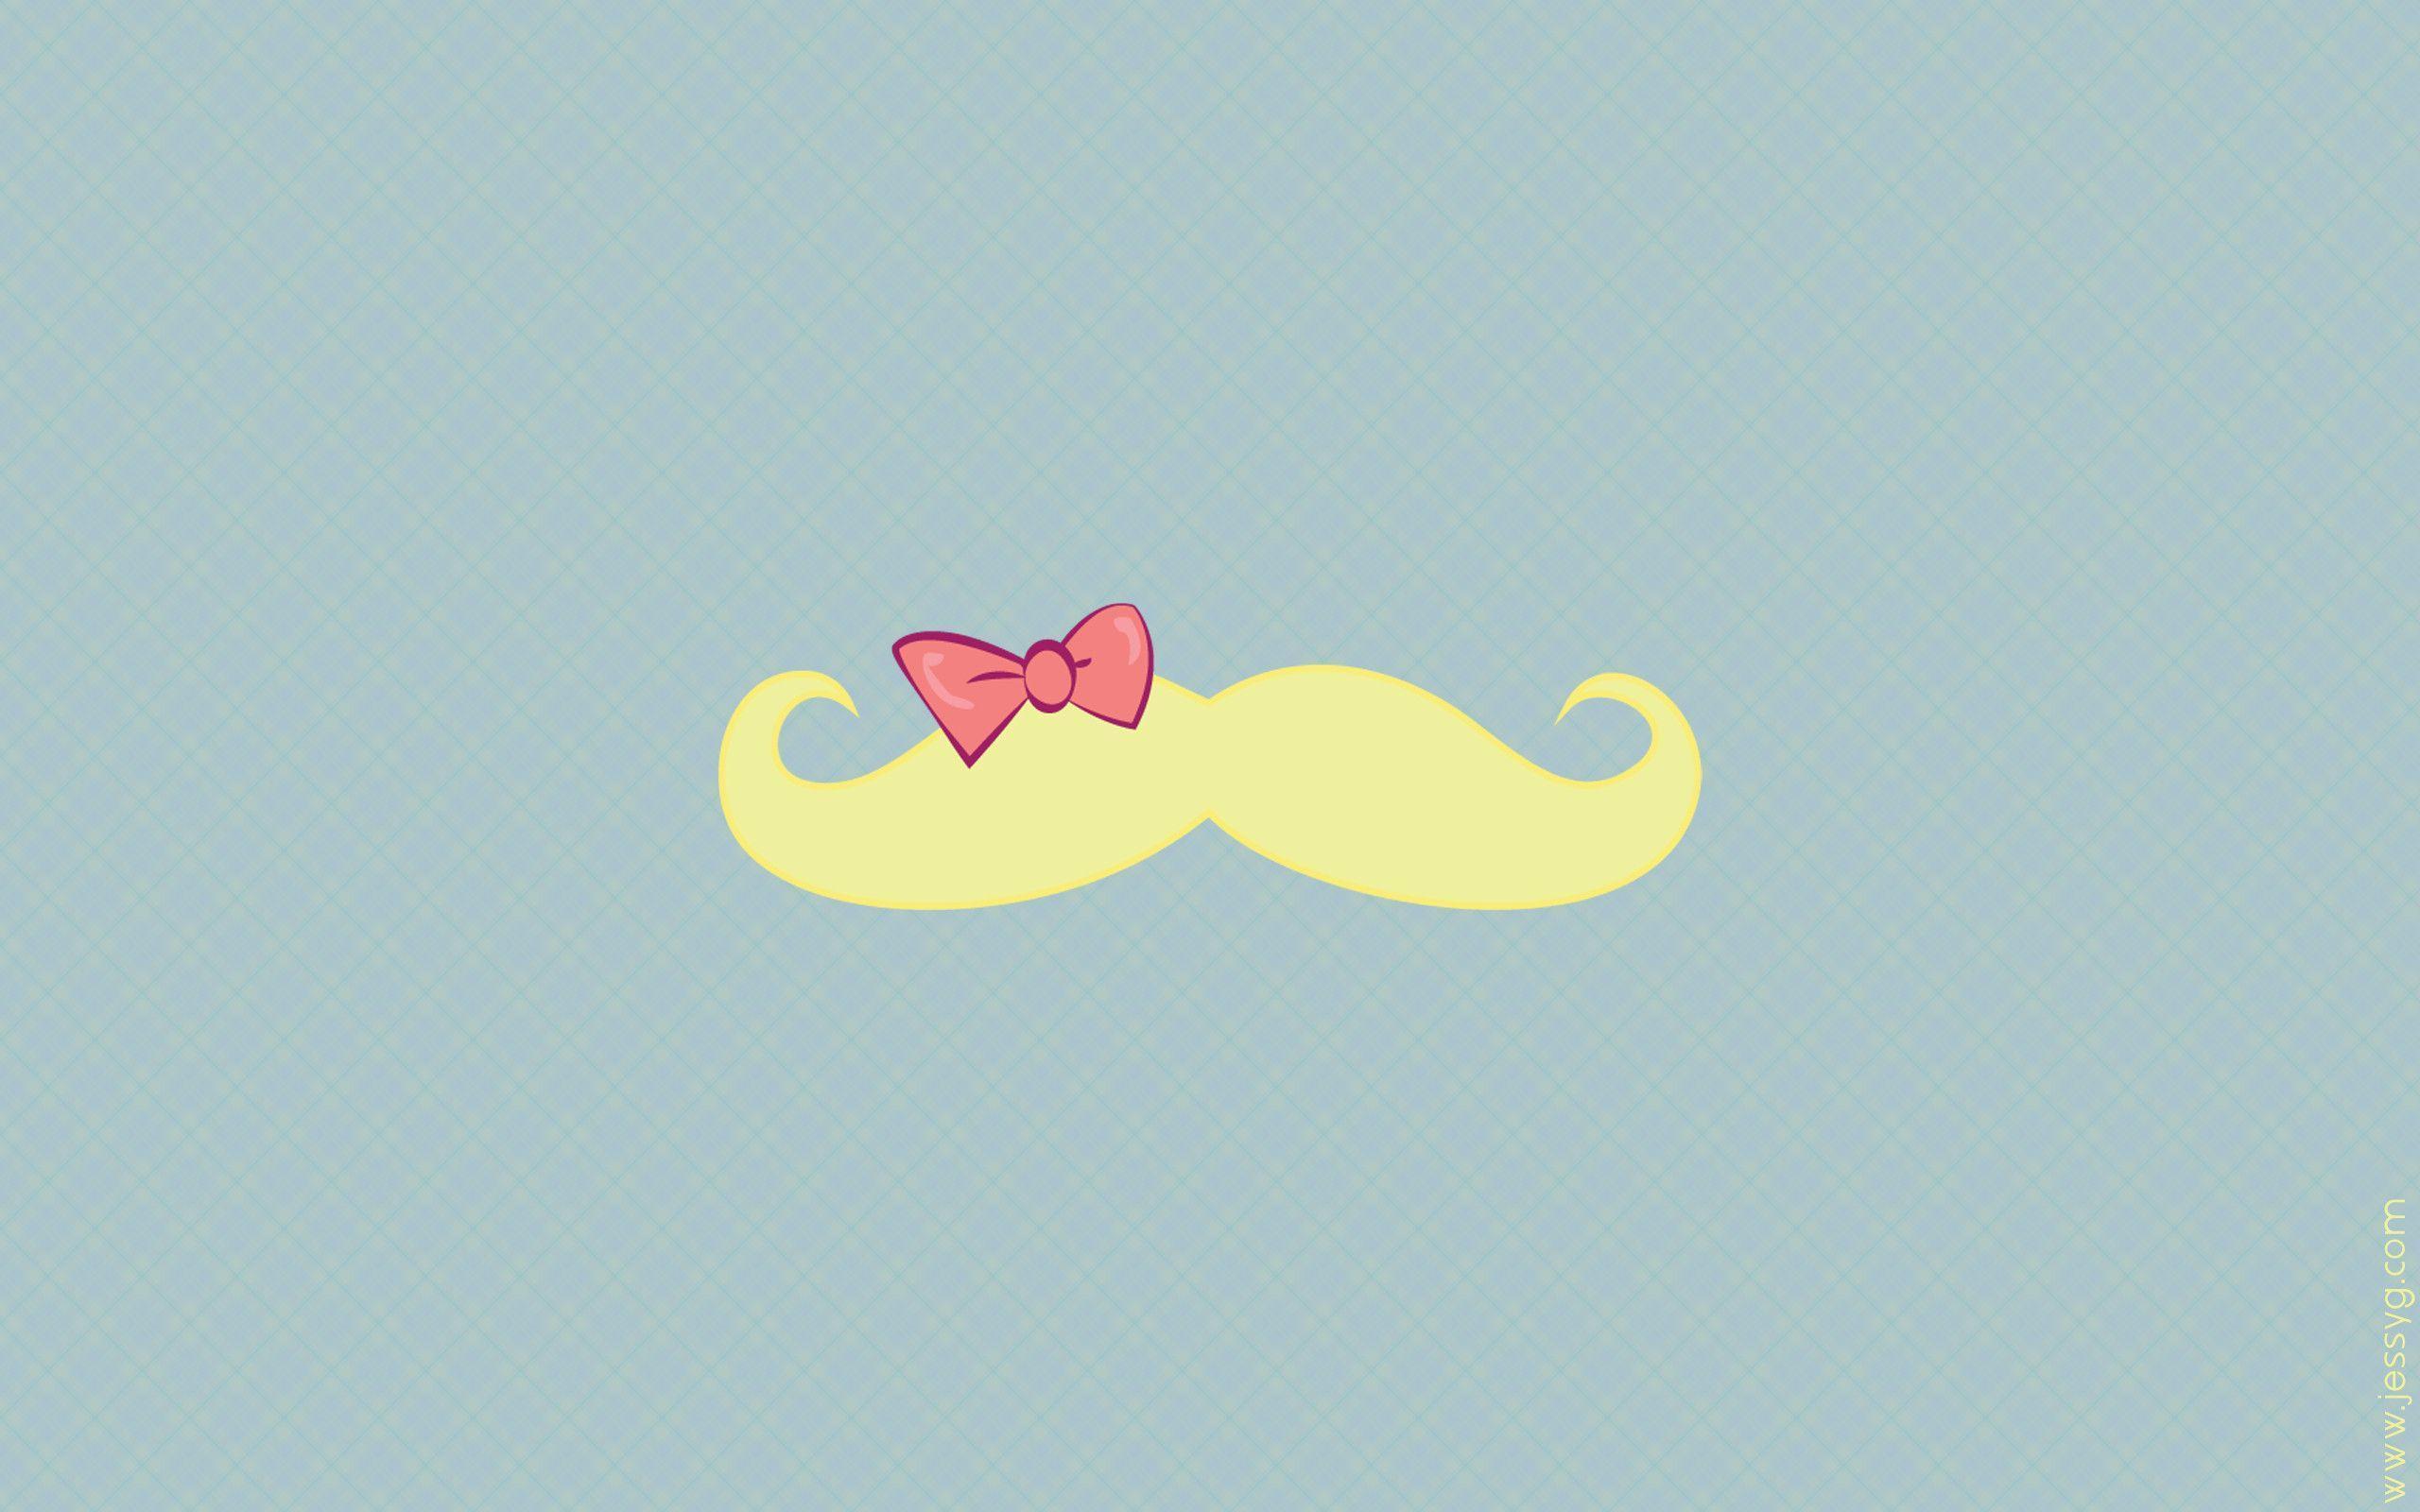 Girly Mustache Backgrounds